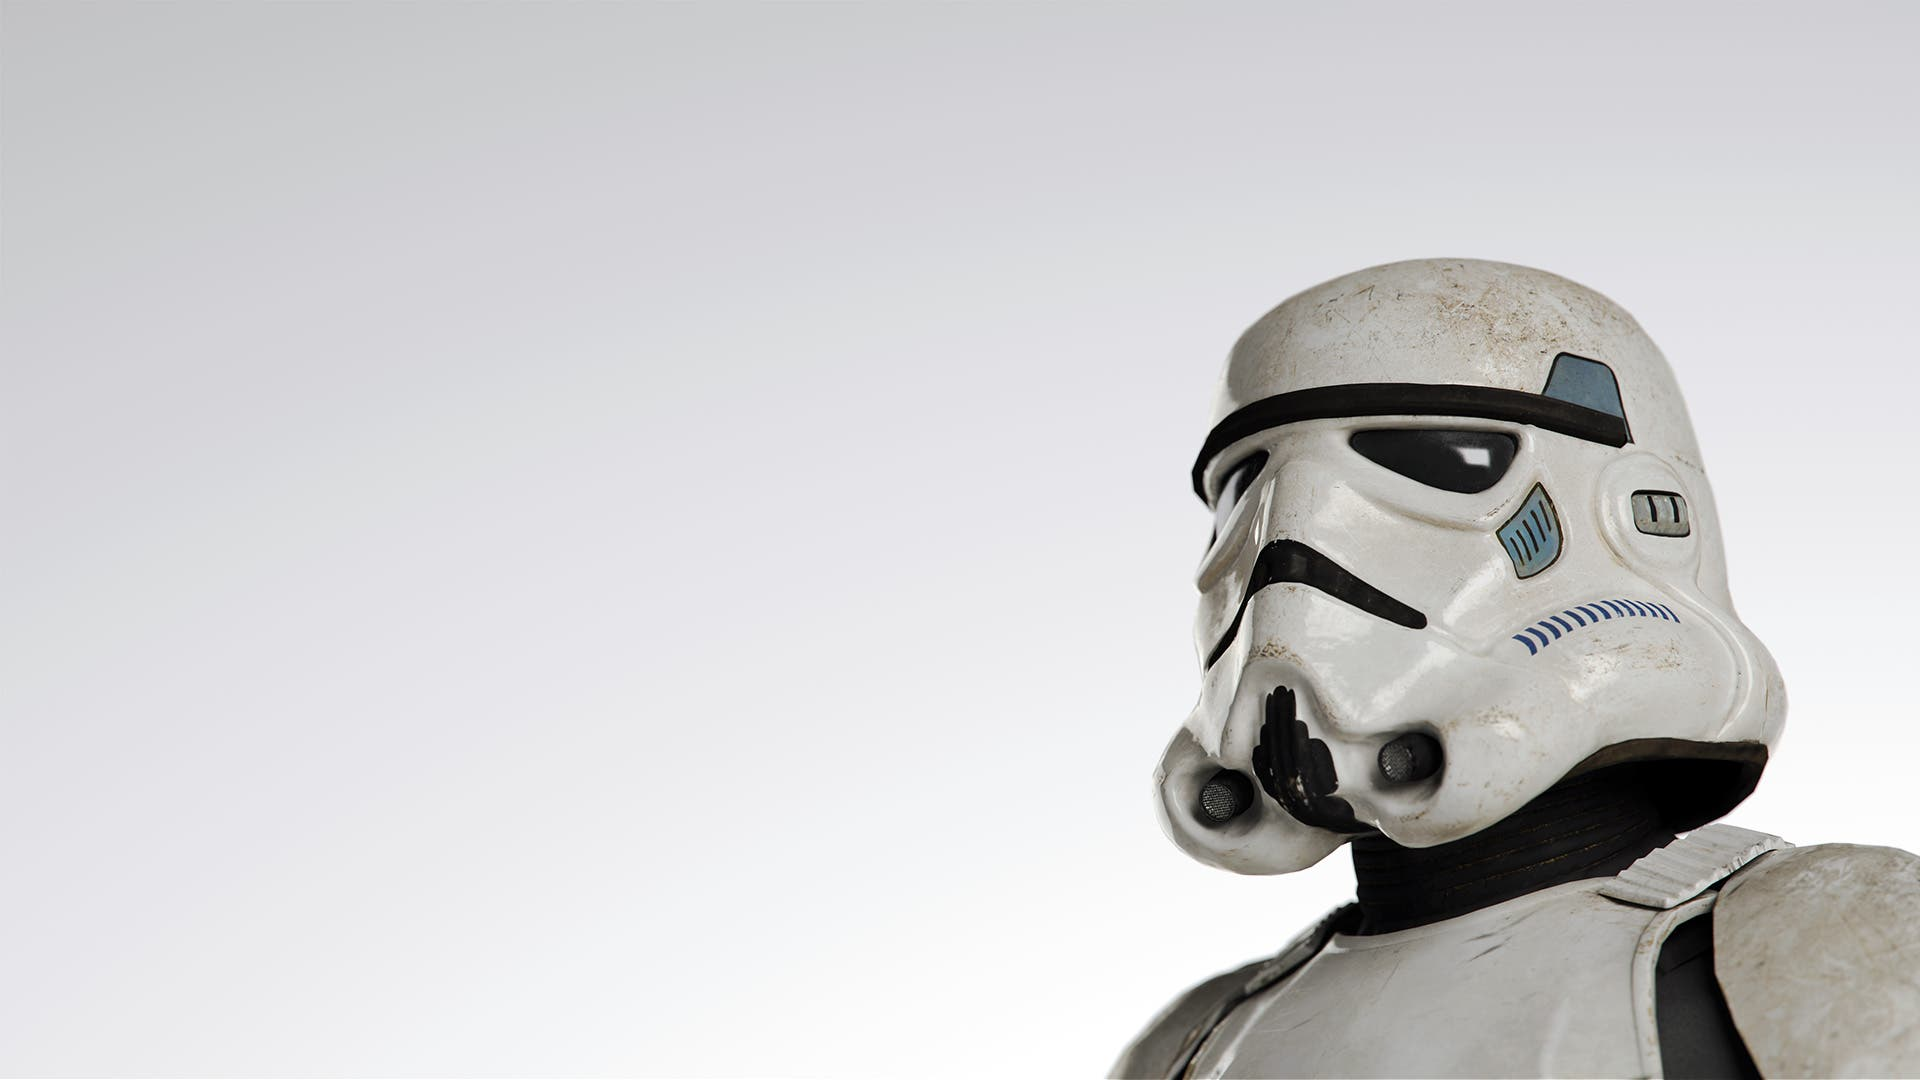 Star Wars Battlefront Muestra Un Nuevo P 243 Ster Somosxbox